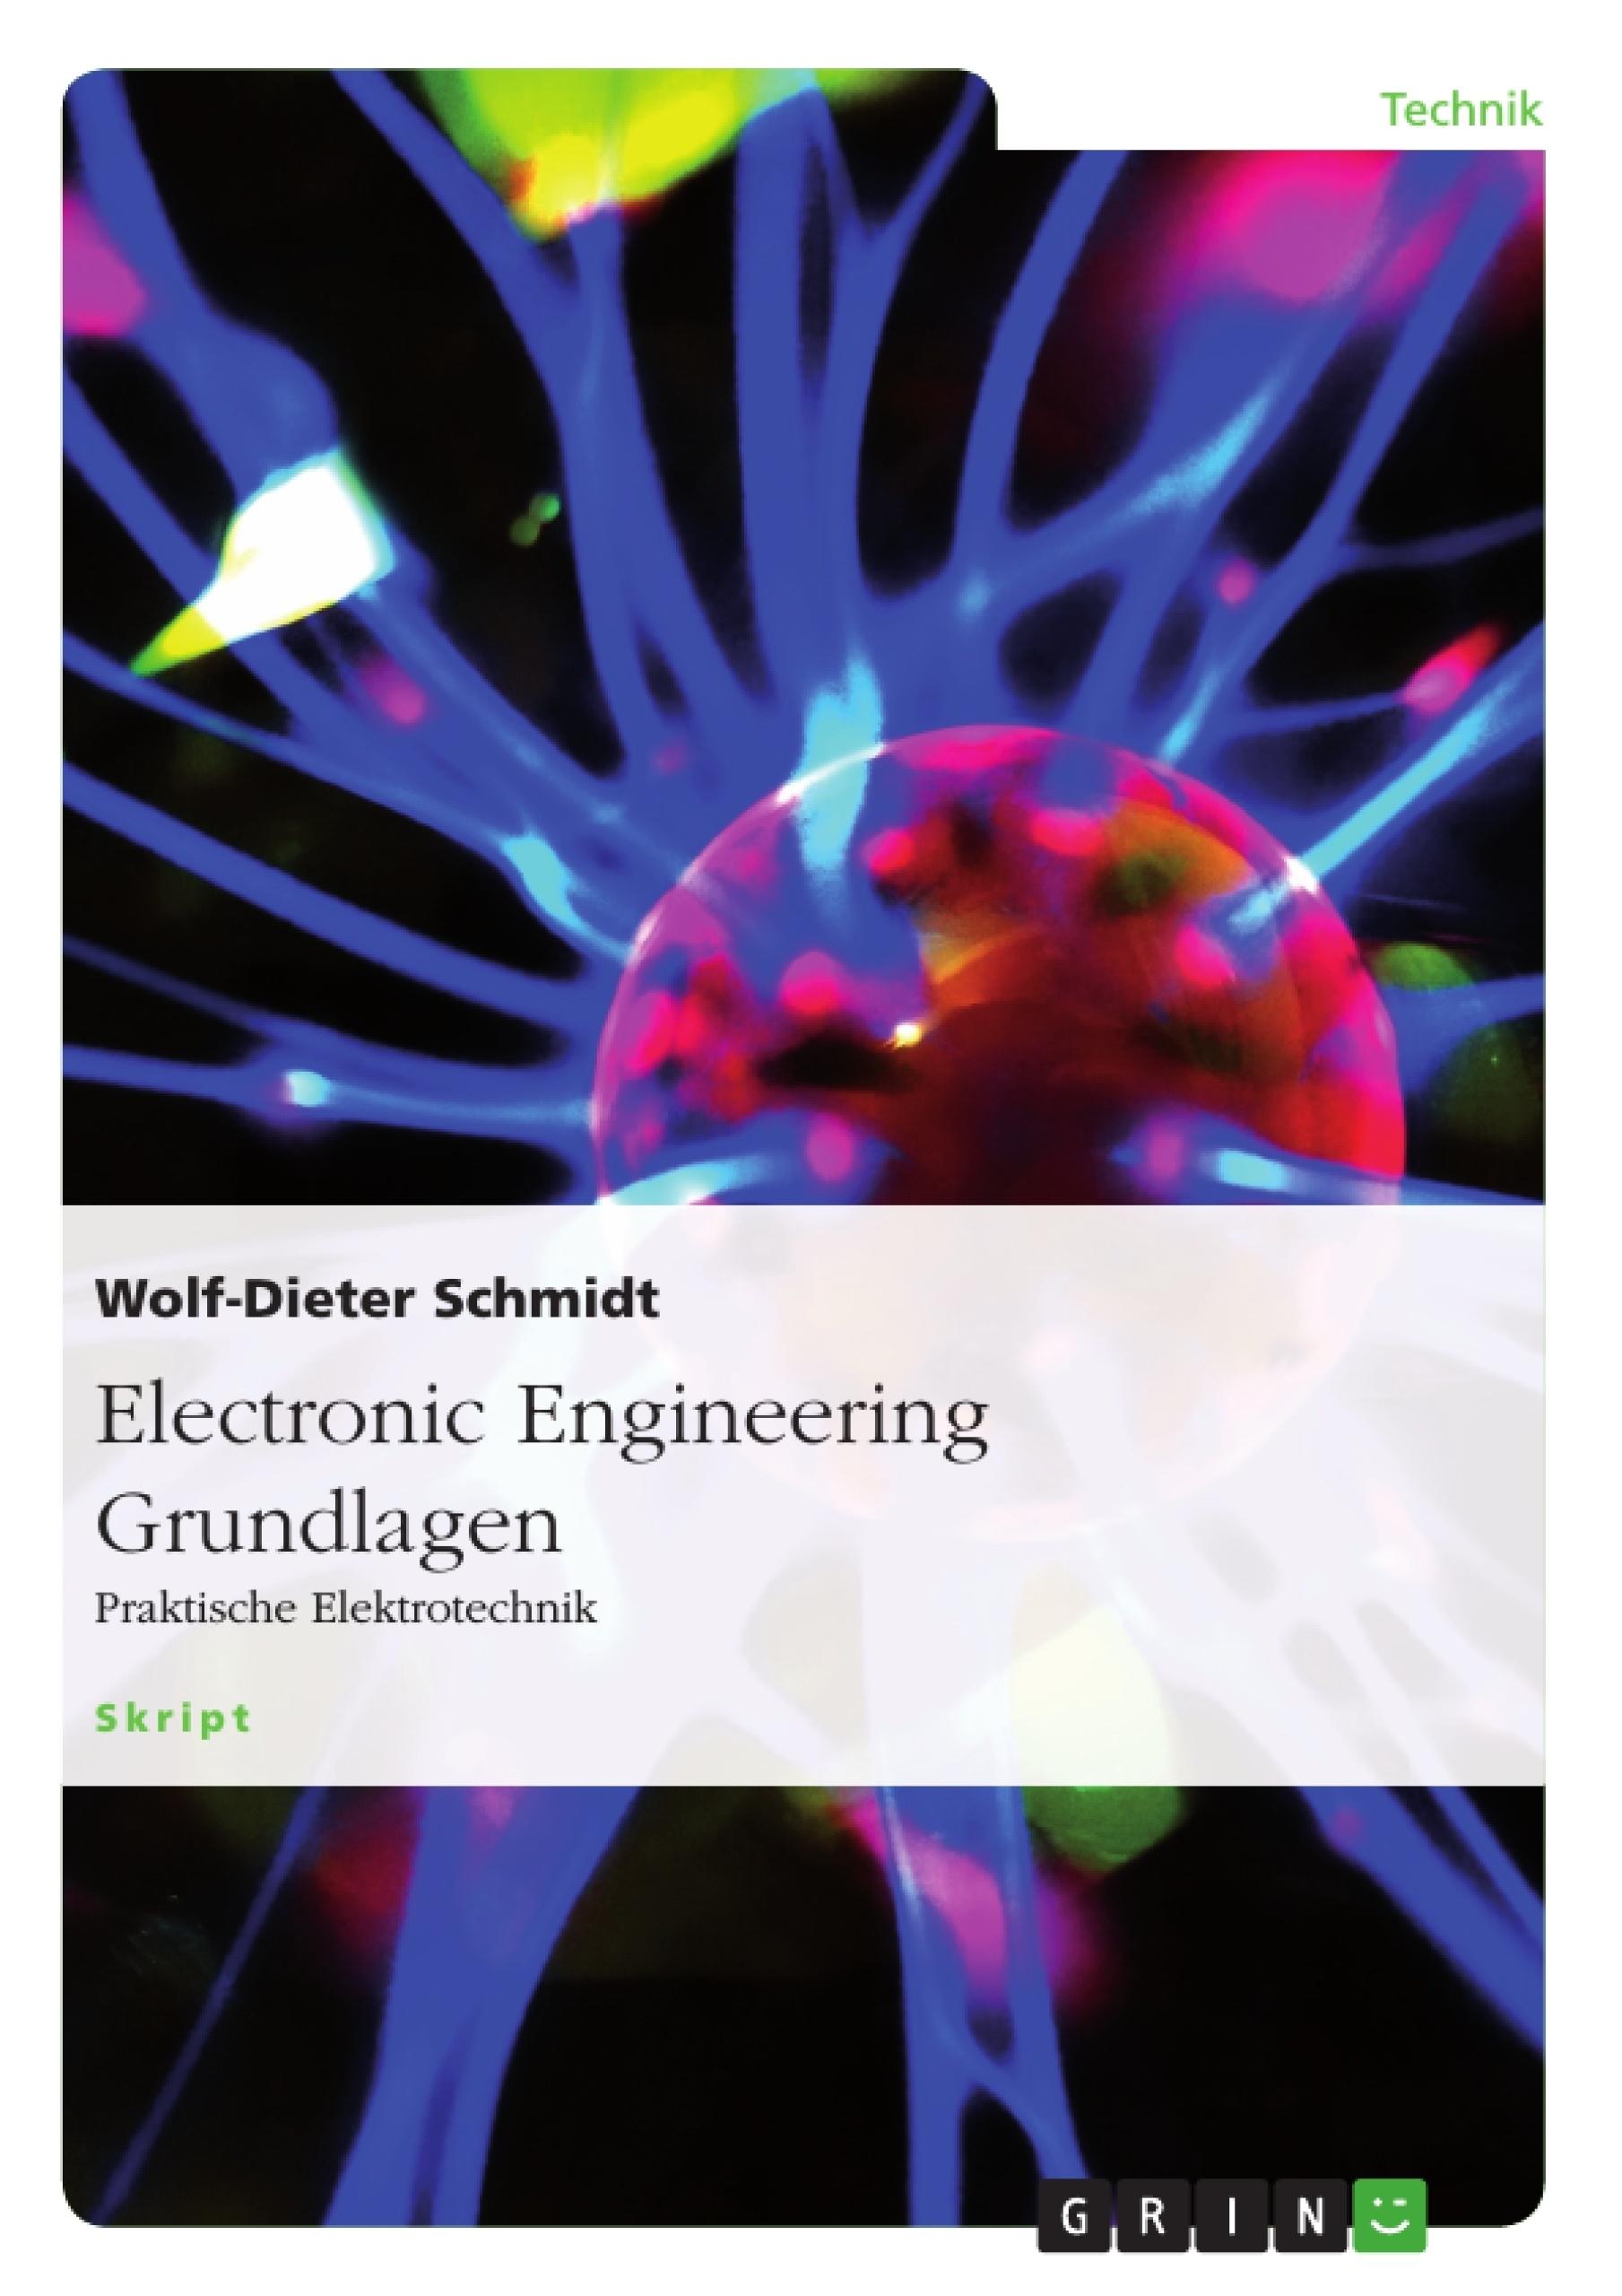 Titel: Electronic Engineering Grundlagen